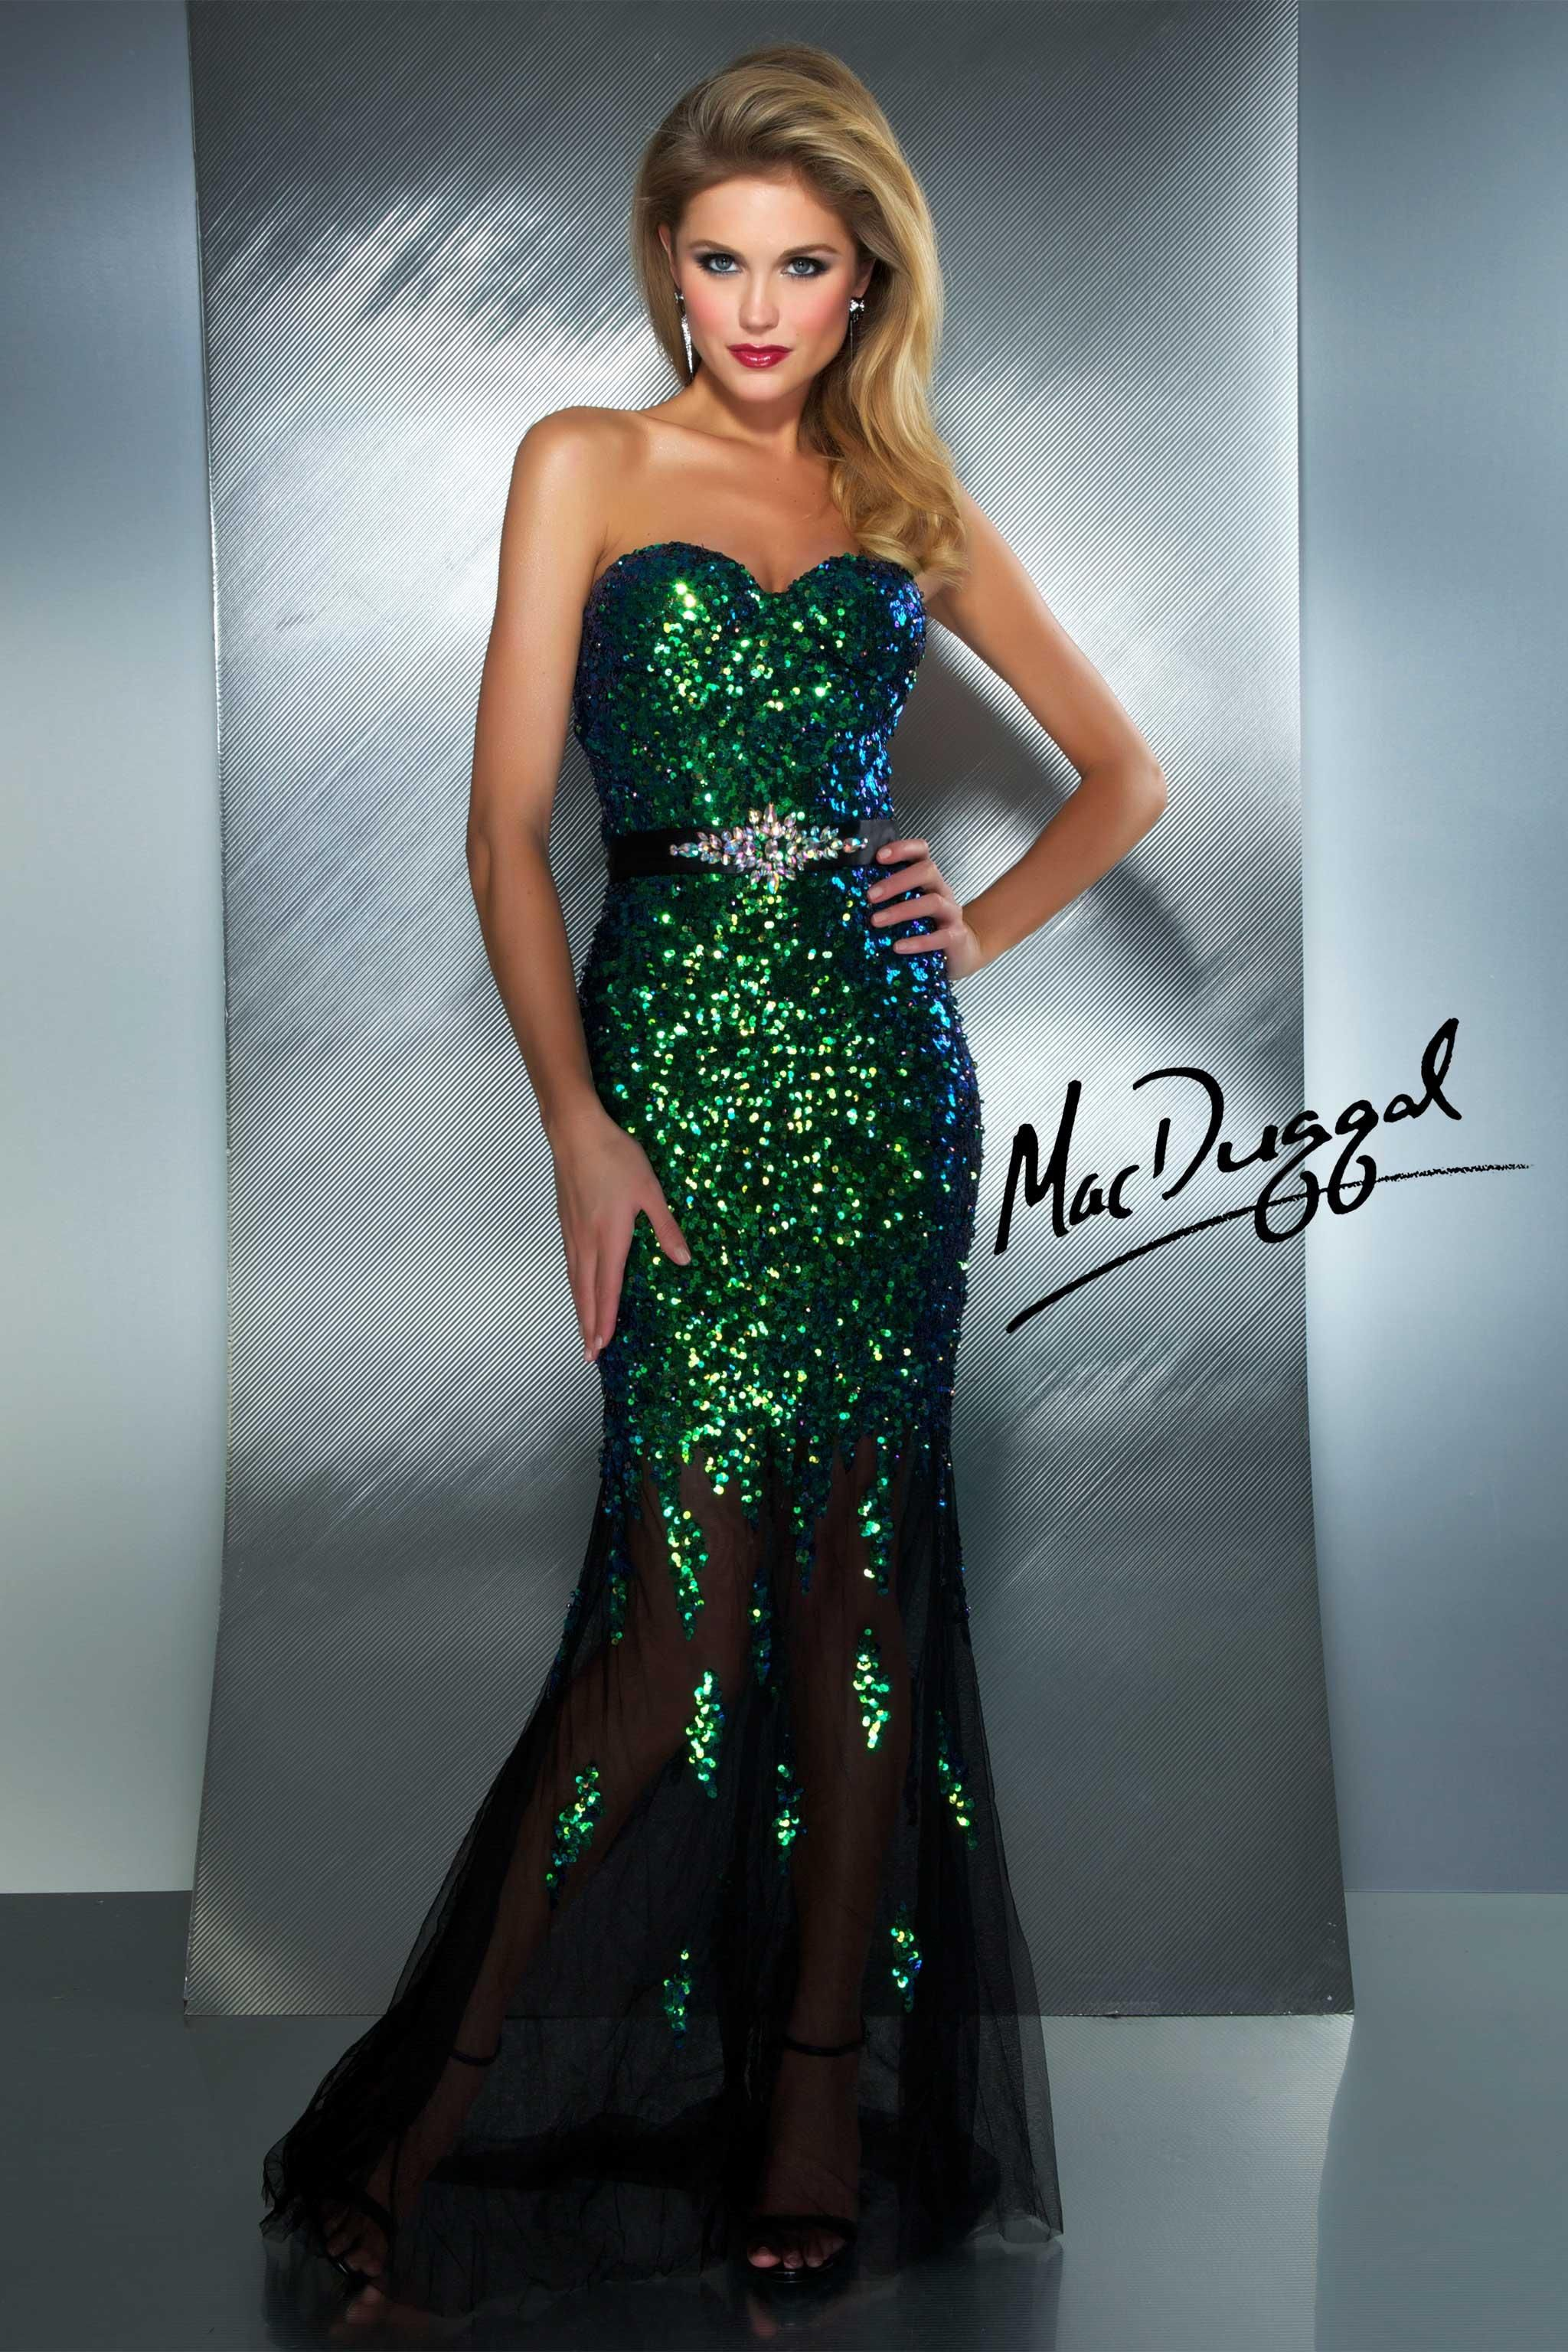 687b7184 Prom Dresses by | Cinderella's Grand Entrance 2.0 - Women's Fashion ...